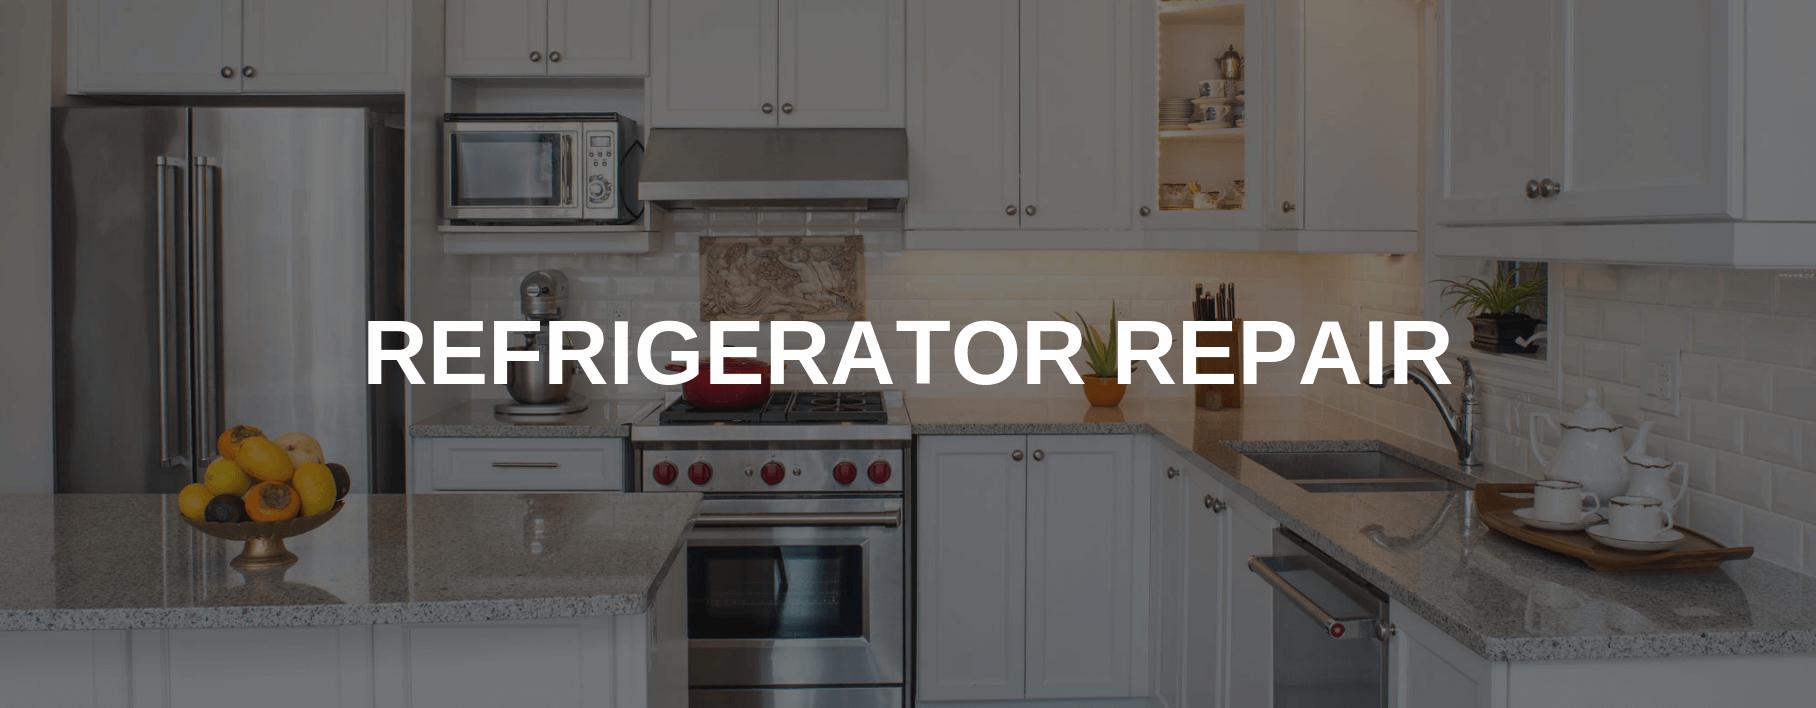 forest hills refrigerator repair